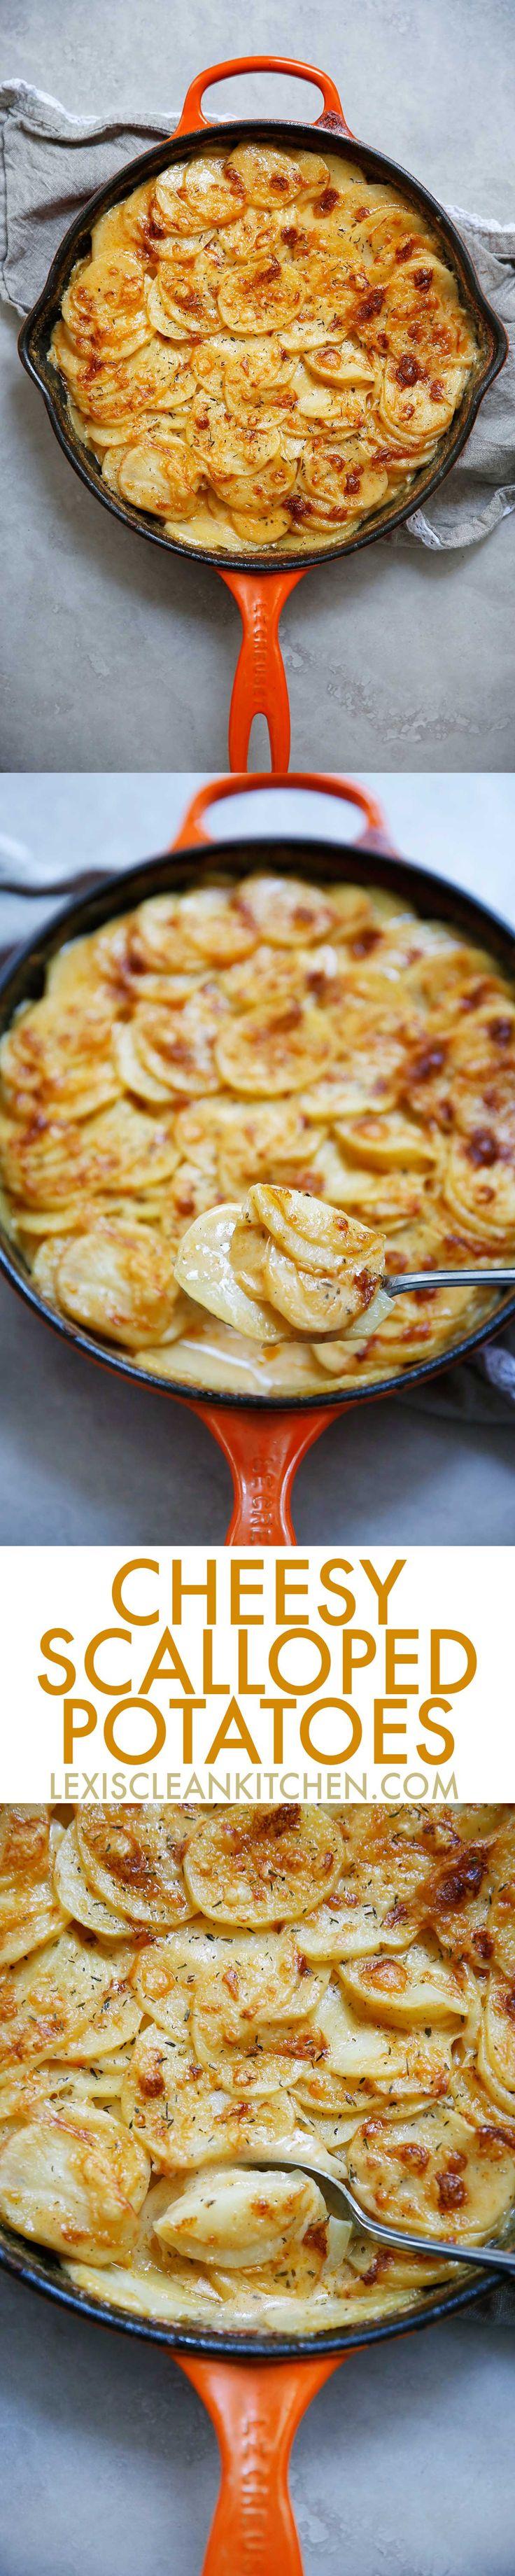 Cheesy Scalloped Potatoes - Lexi's Clean Kitchen #healthier #scalloped #potatoes #thanksgiving